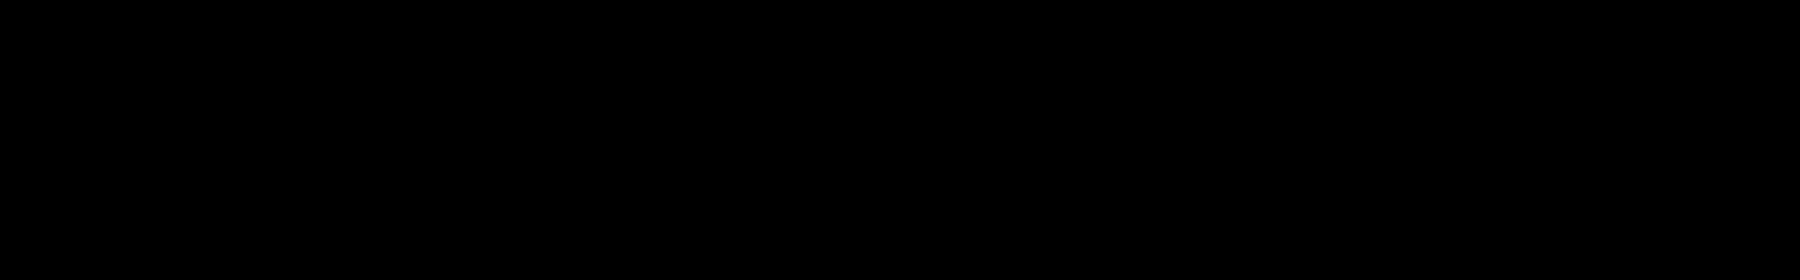 GLO-FI 2 audio waveform